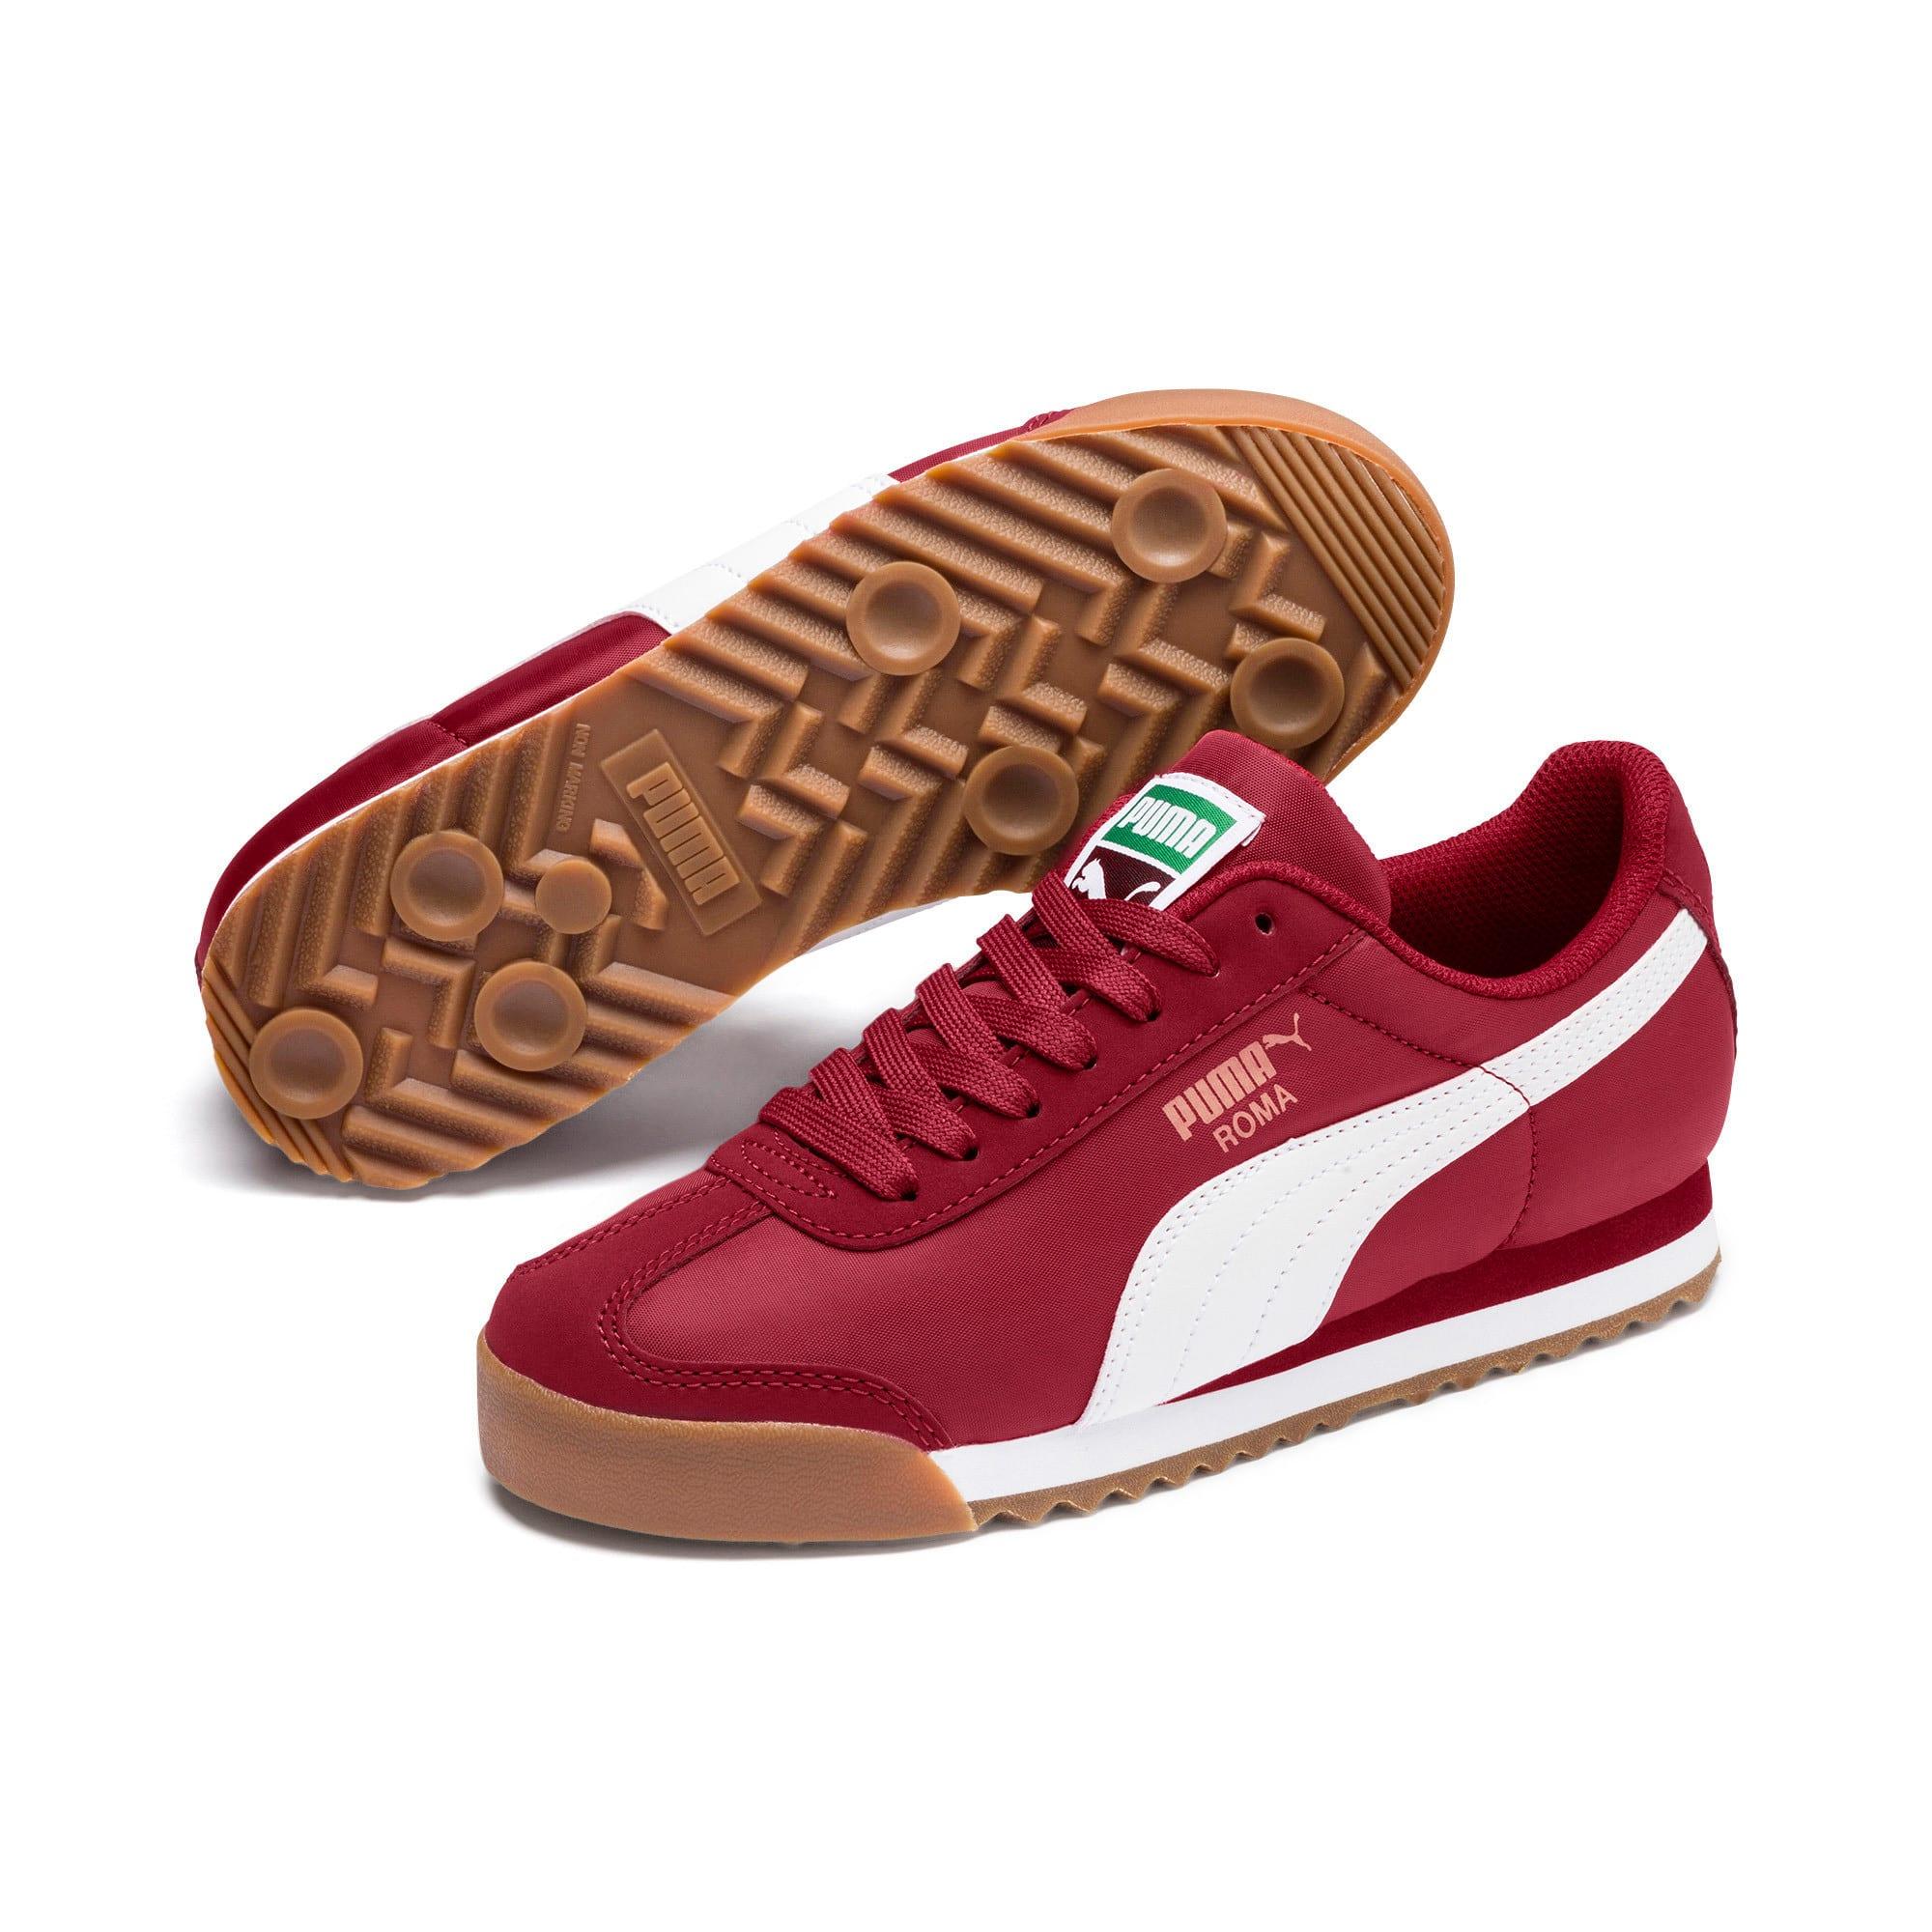 Thumbnail 2 of Roma Basic Summer Sneakers JR, Rhubarb-Puma White, medium